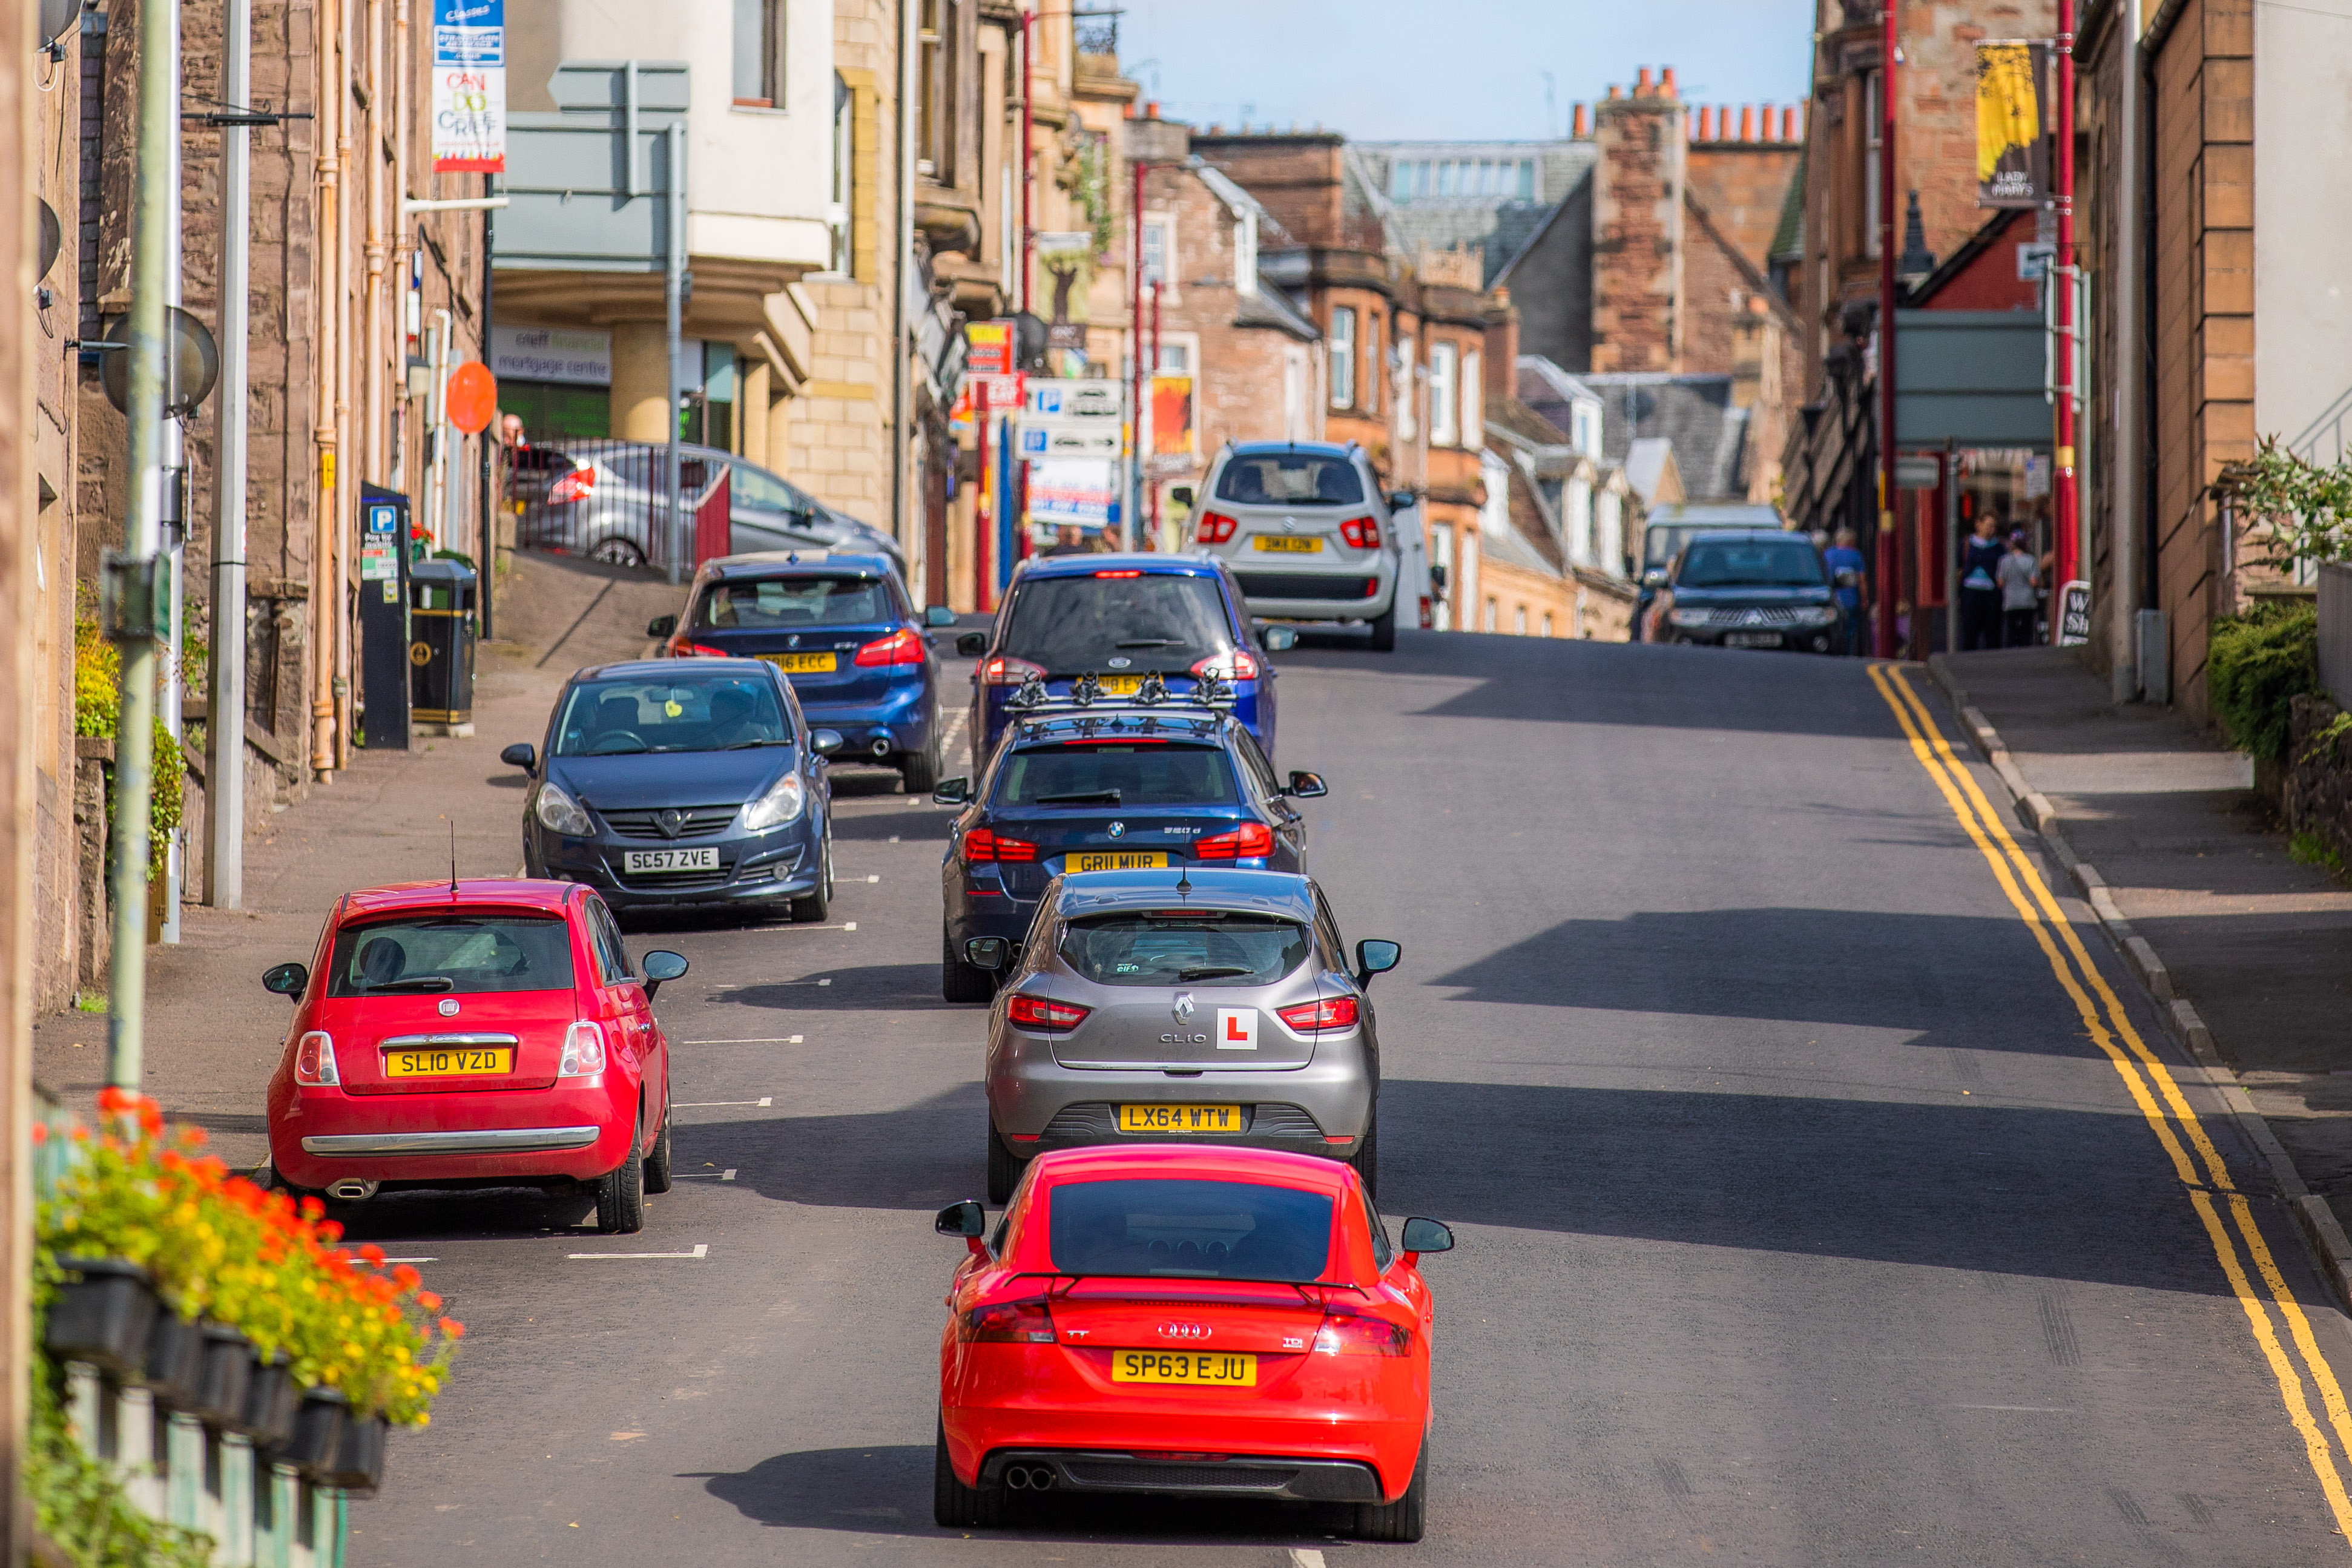 Crieff High Street. Picture: Steve MacDougall.